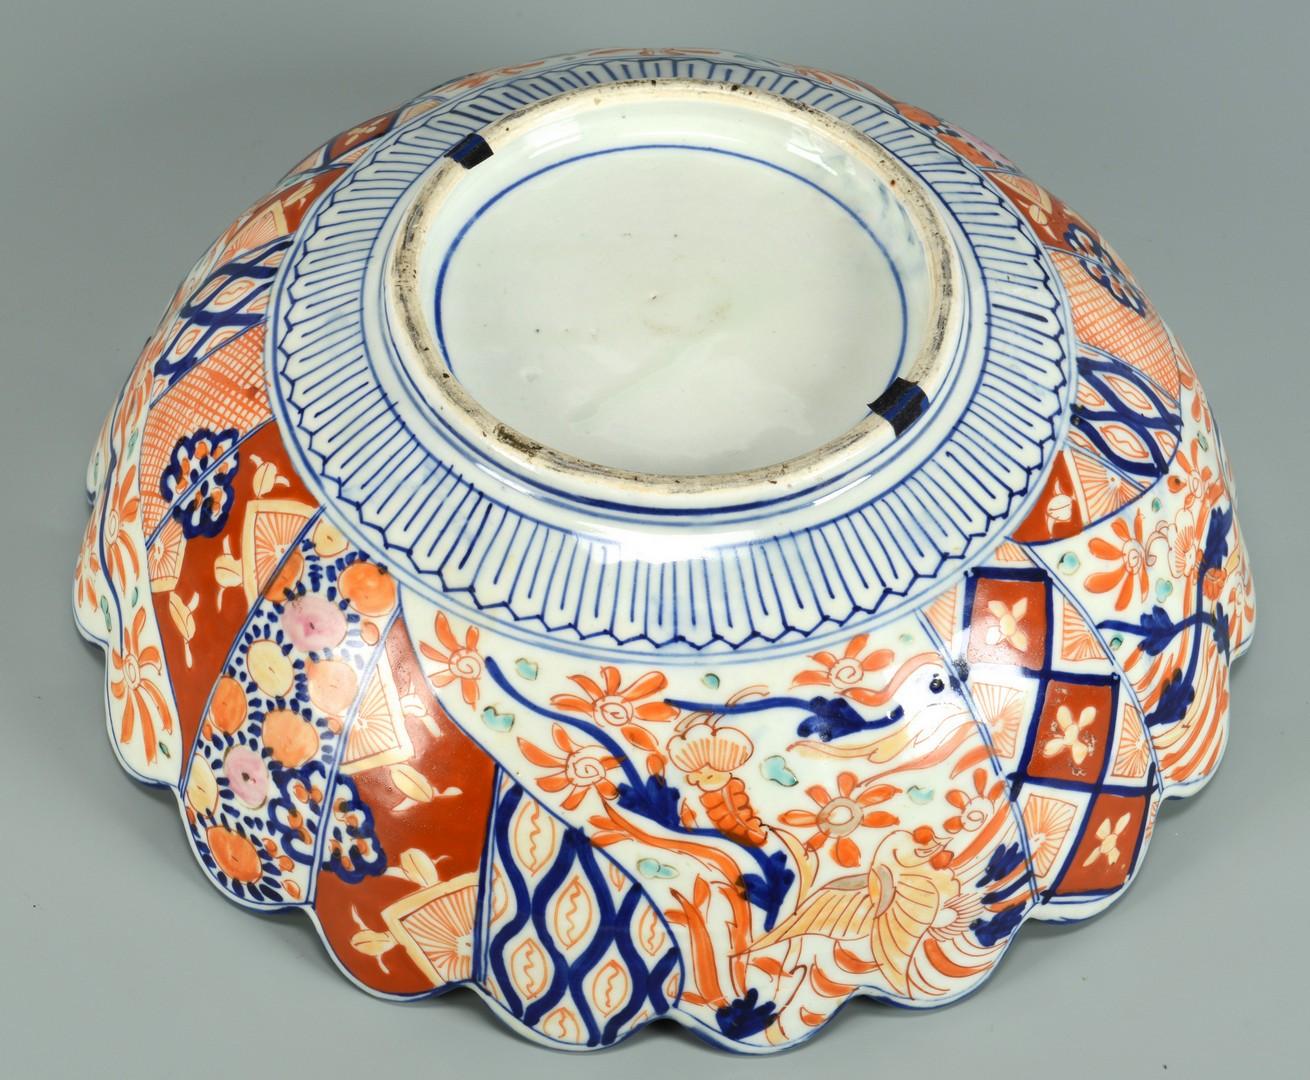 Lot 3383222: 2 Imari Porcelain Bowls